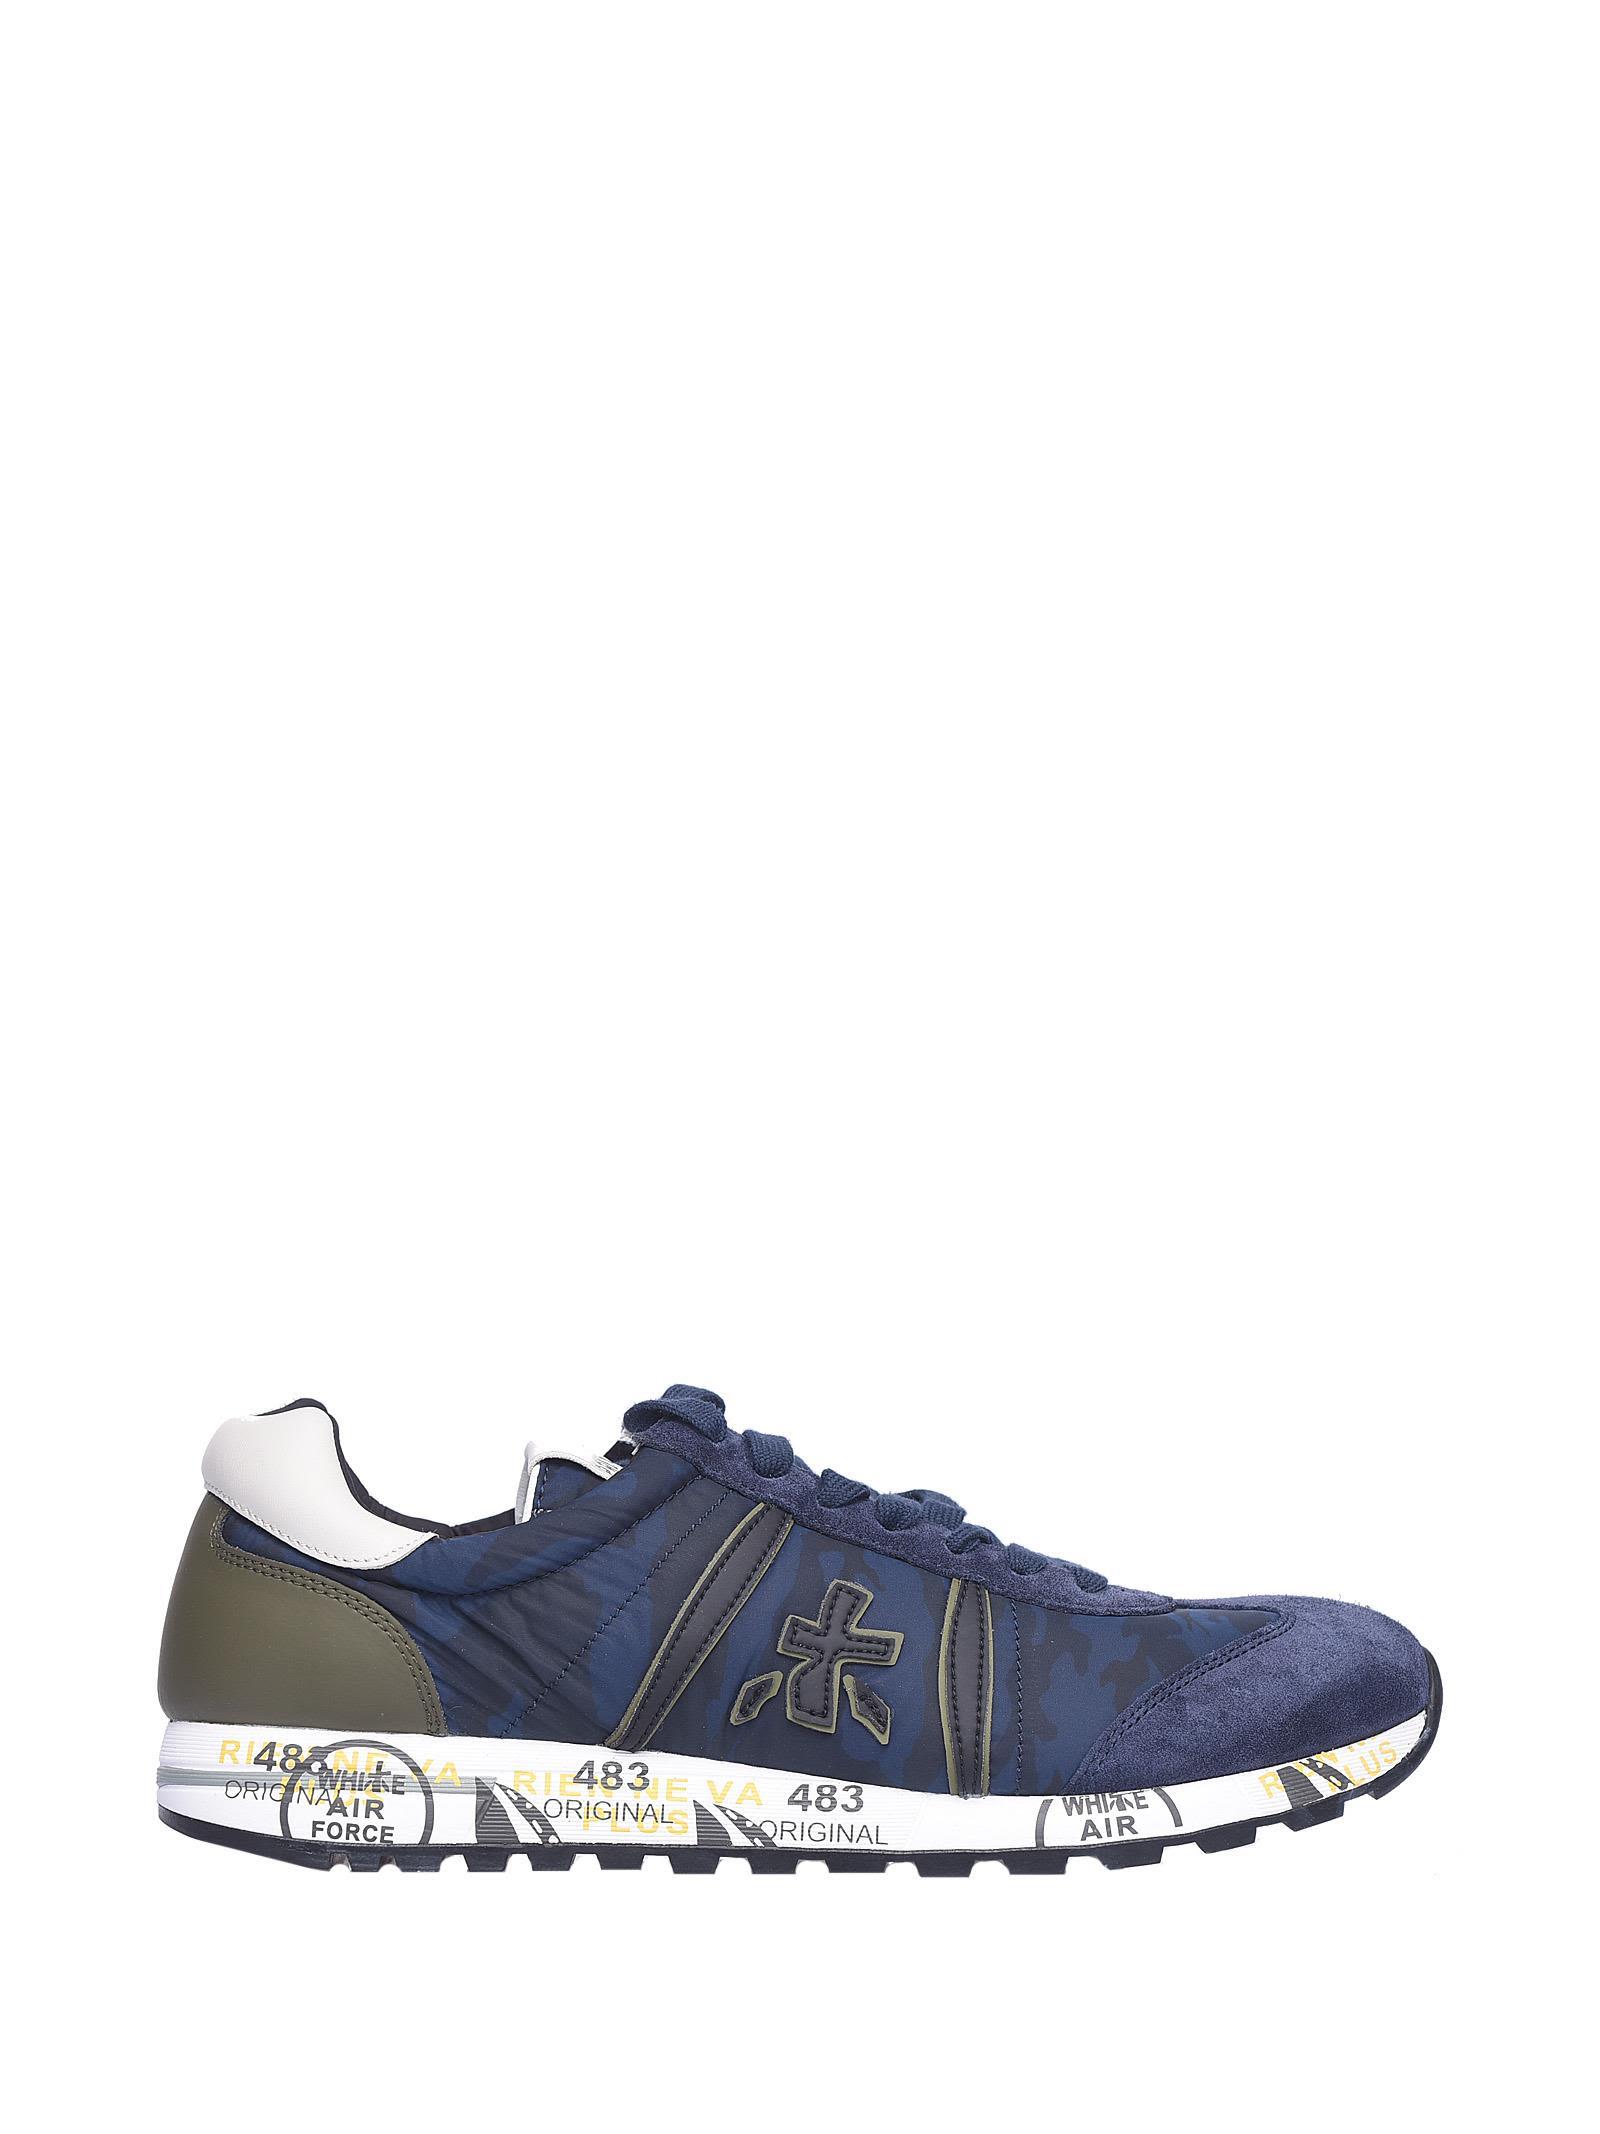 Premiata Lucy 2460 Sneakers Blue